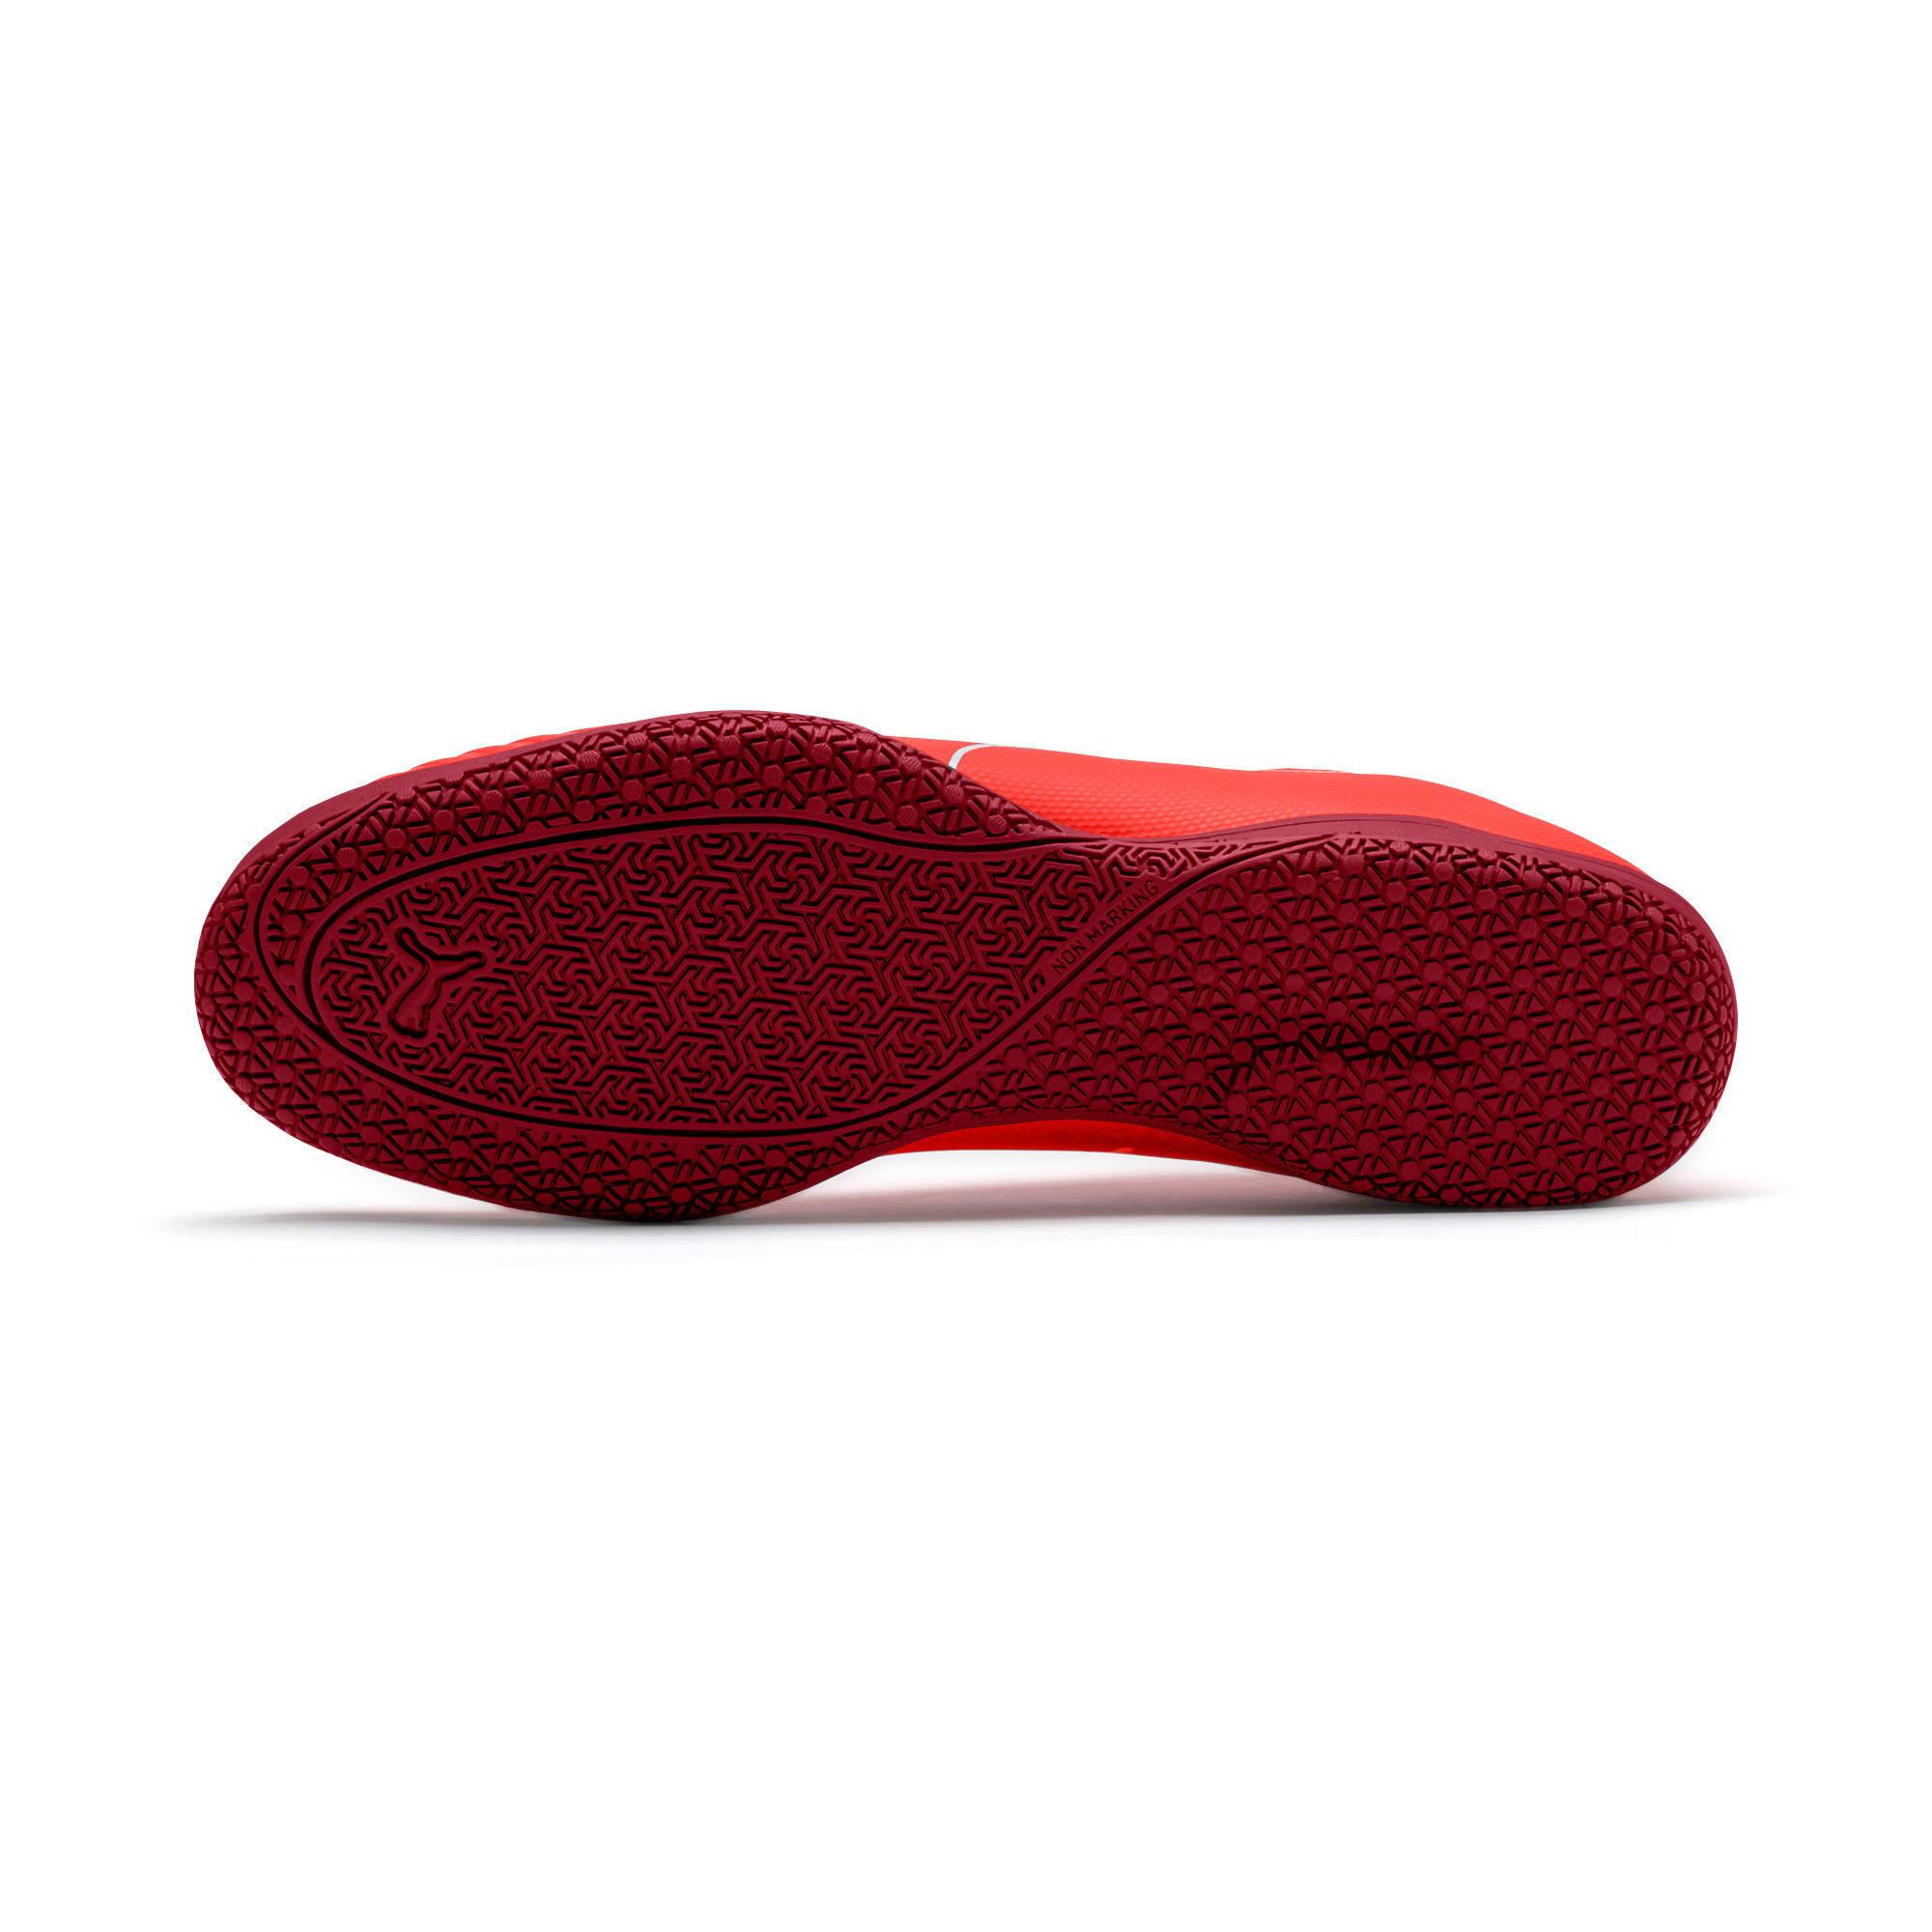 Thumbnail 5 of 365 Sala 2 Men's Soccer Shoes, Nrgy Red-Rhubarb, medium